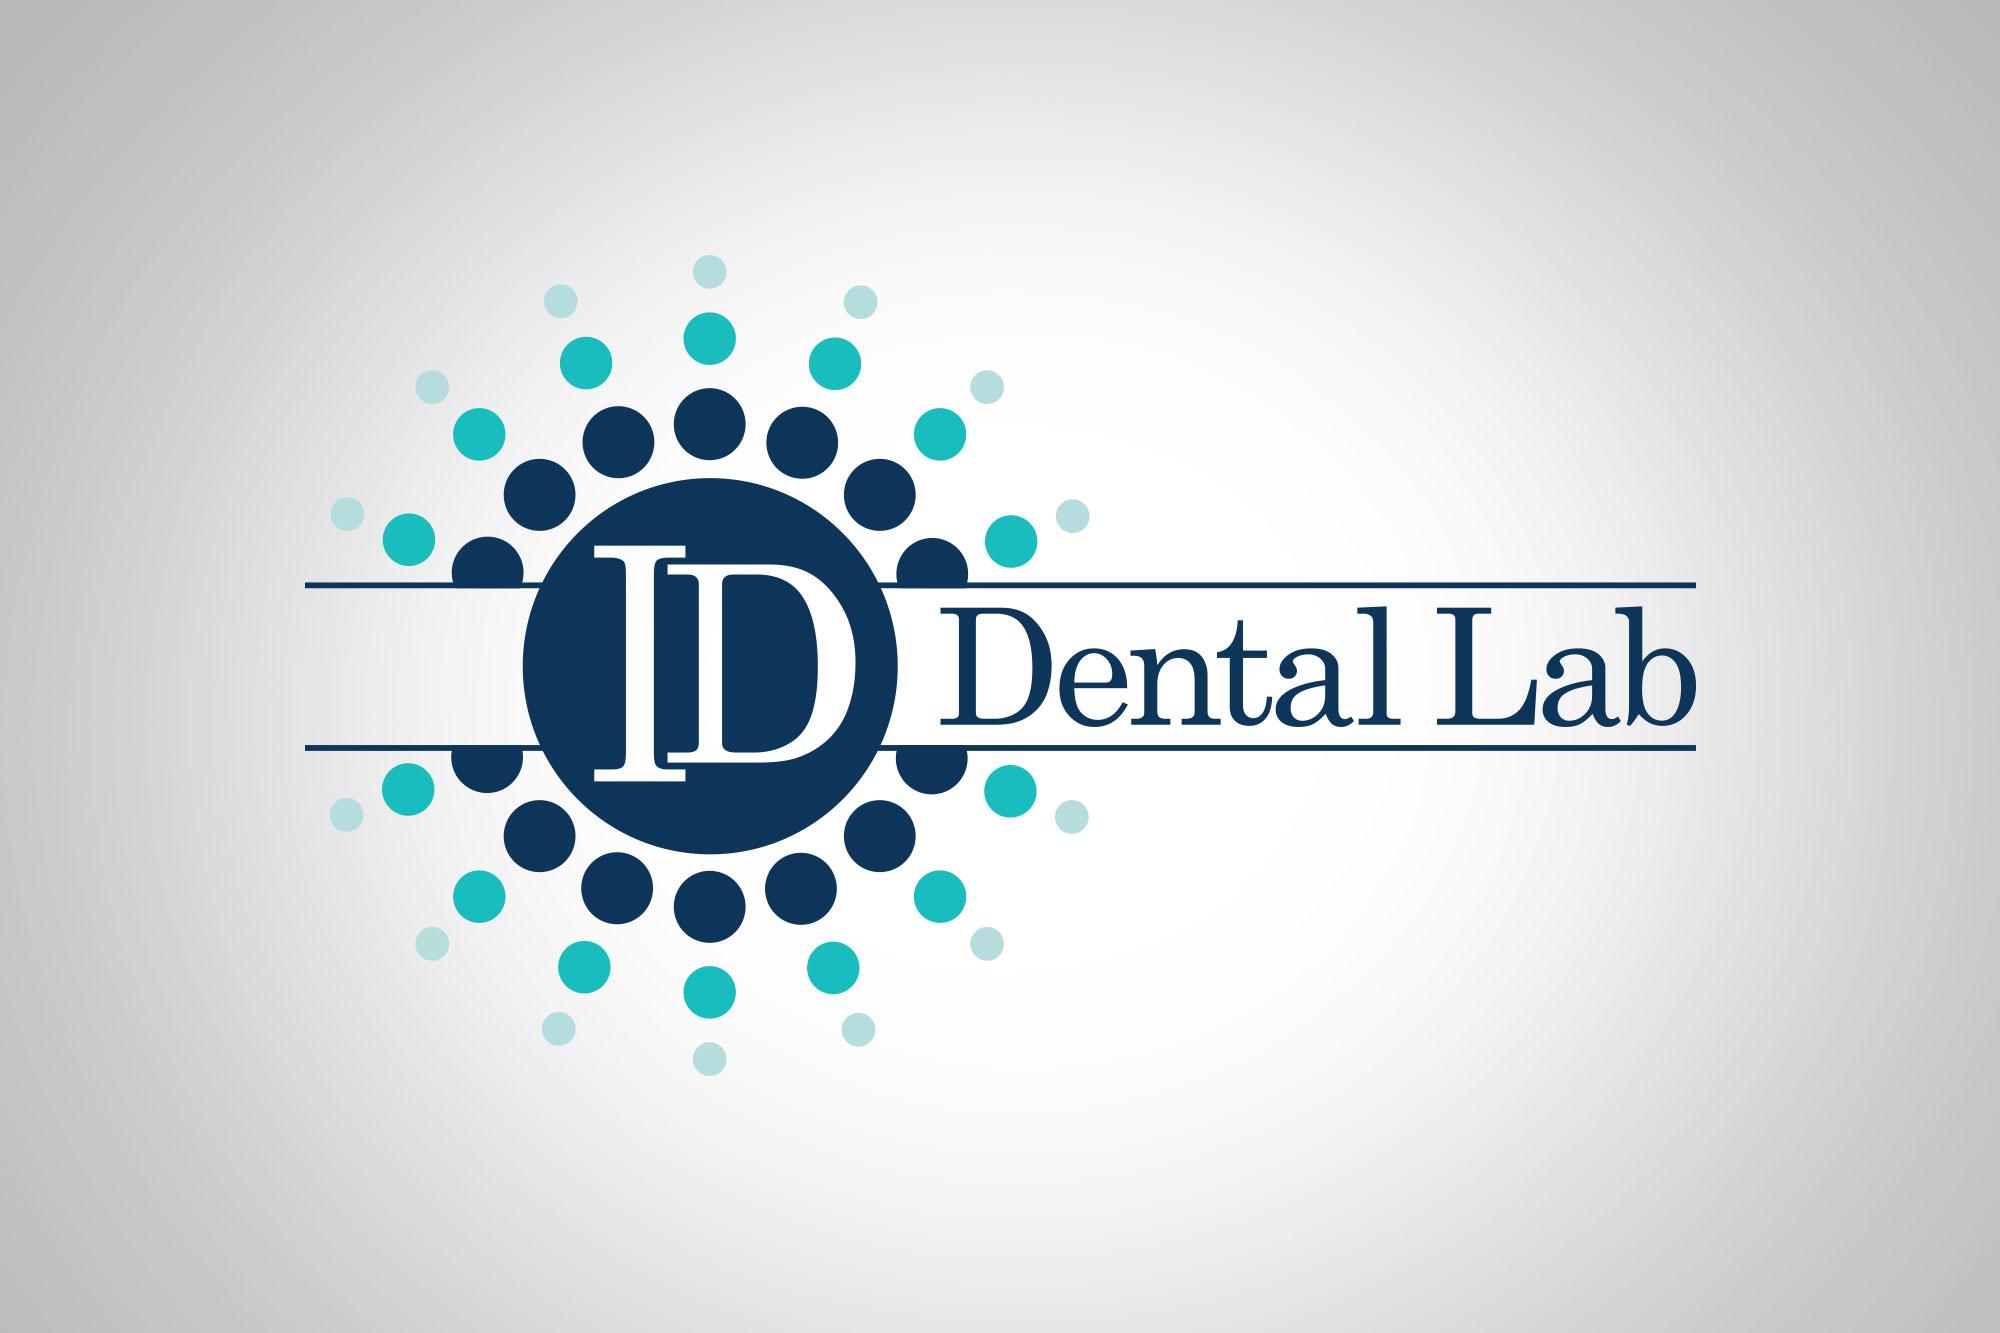 ID Dental Laboratory Logo